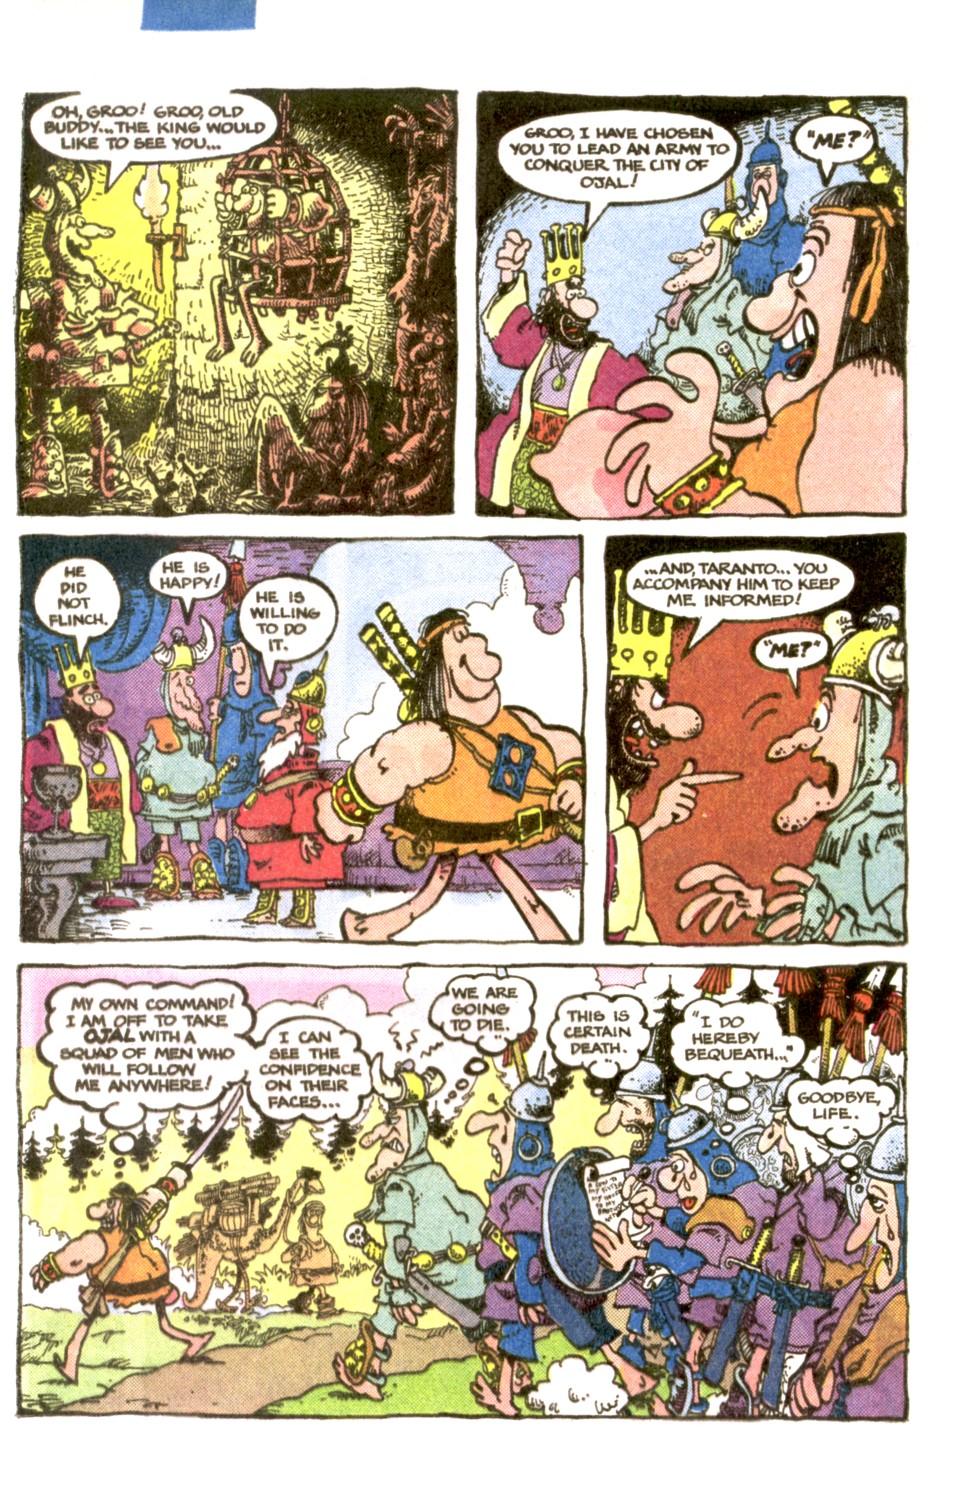 Read online Sergio Aragonés Groo the Wanderer comic -  Issue #1 - 14